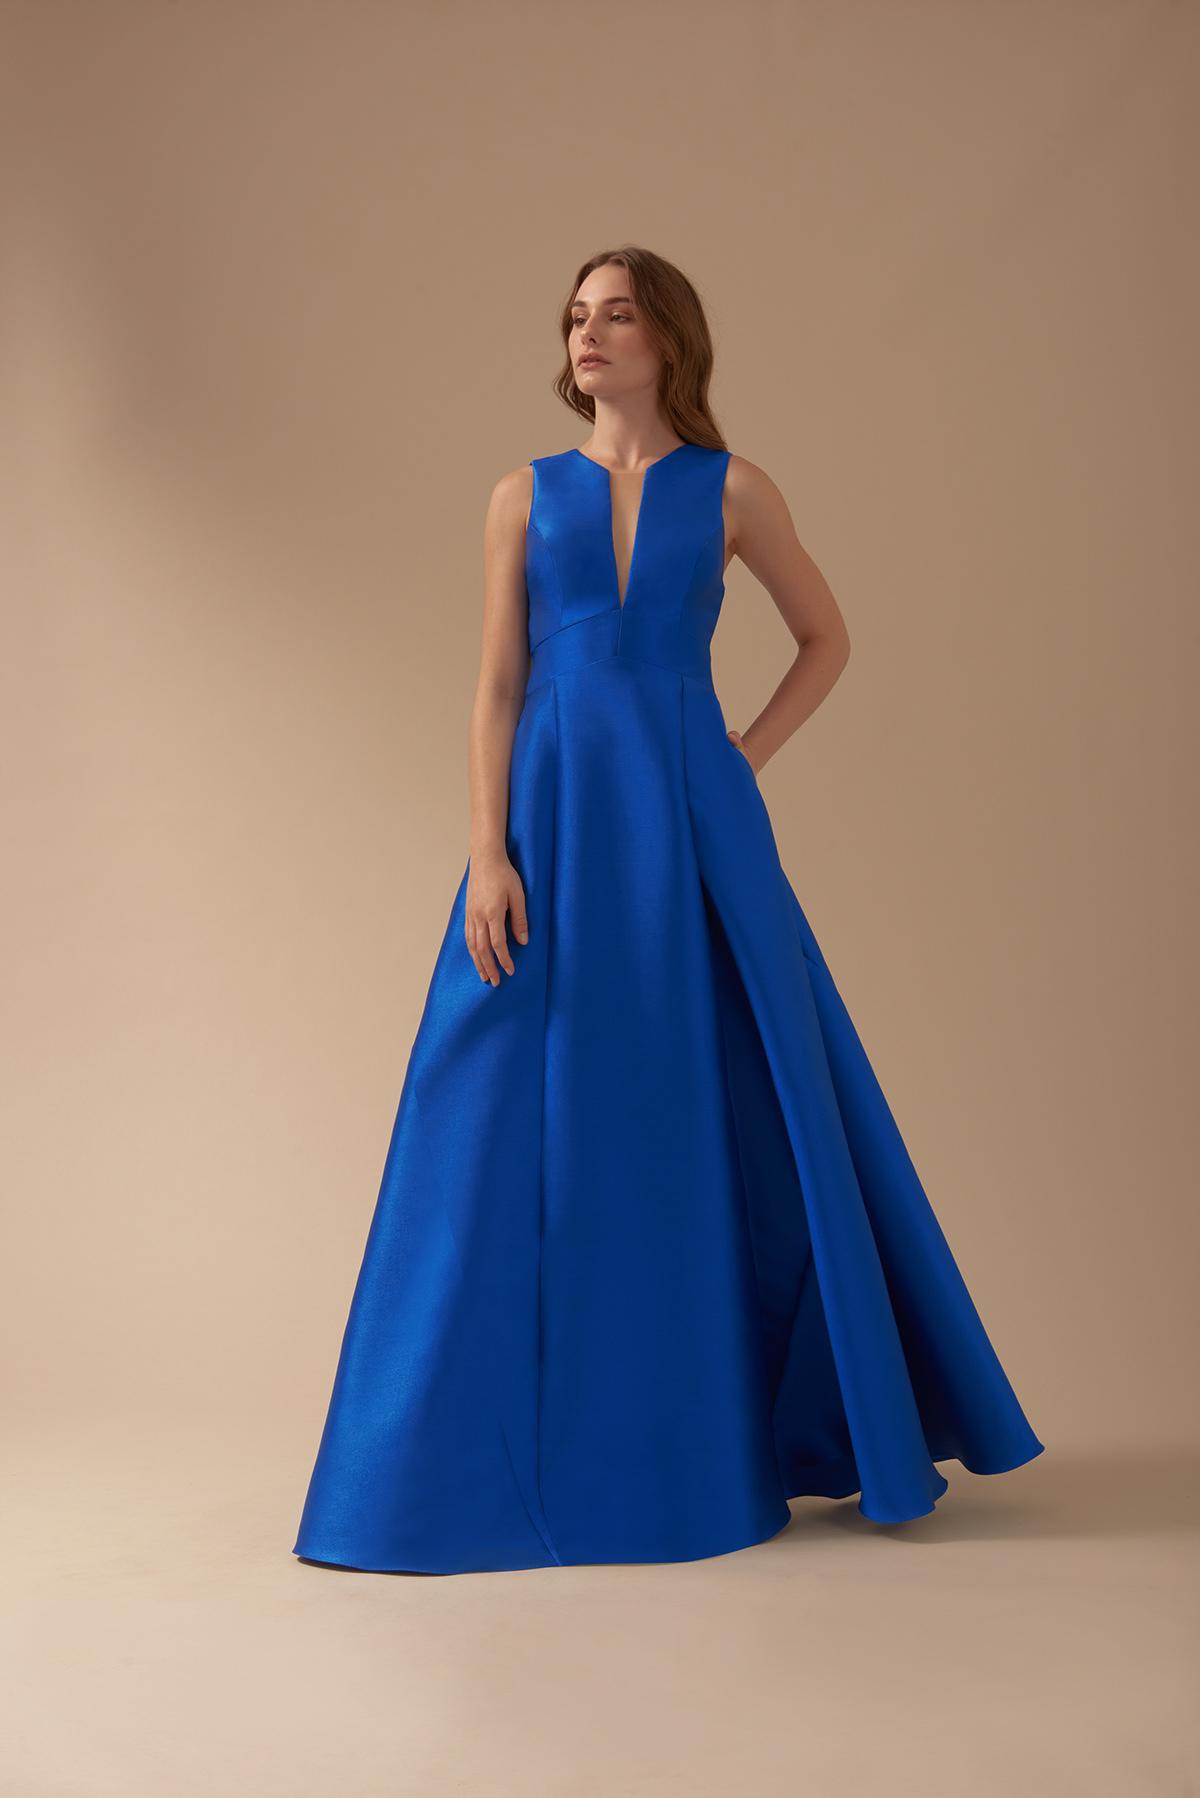 moda Fashion  retouch dress beauty editorial High End photoshop retoucher Lookbook